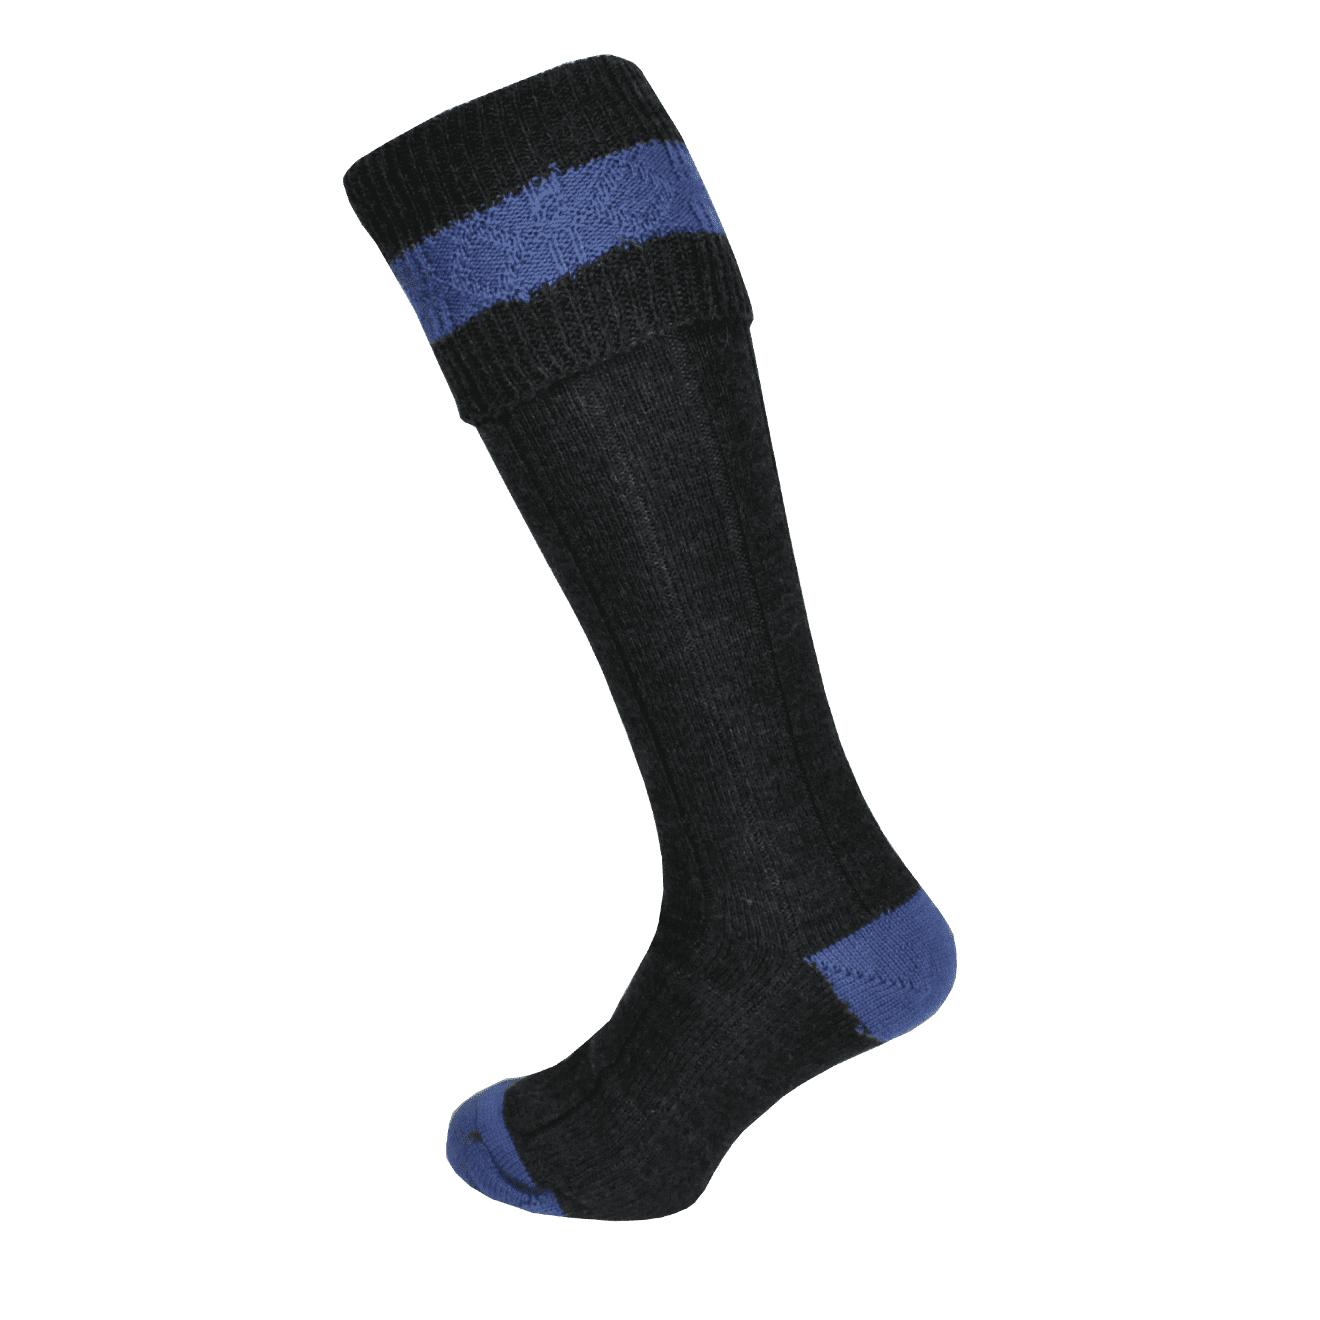 Macfarlaine Contrast Shooting Socks Charcoal / Denim